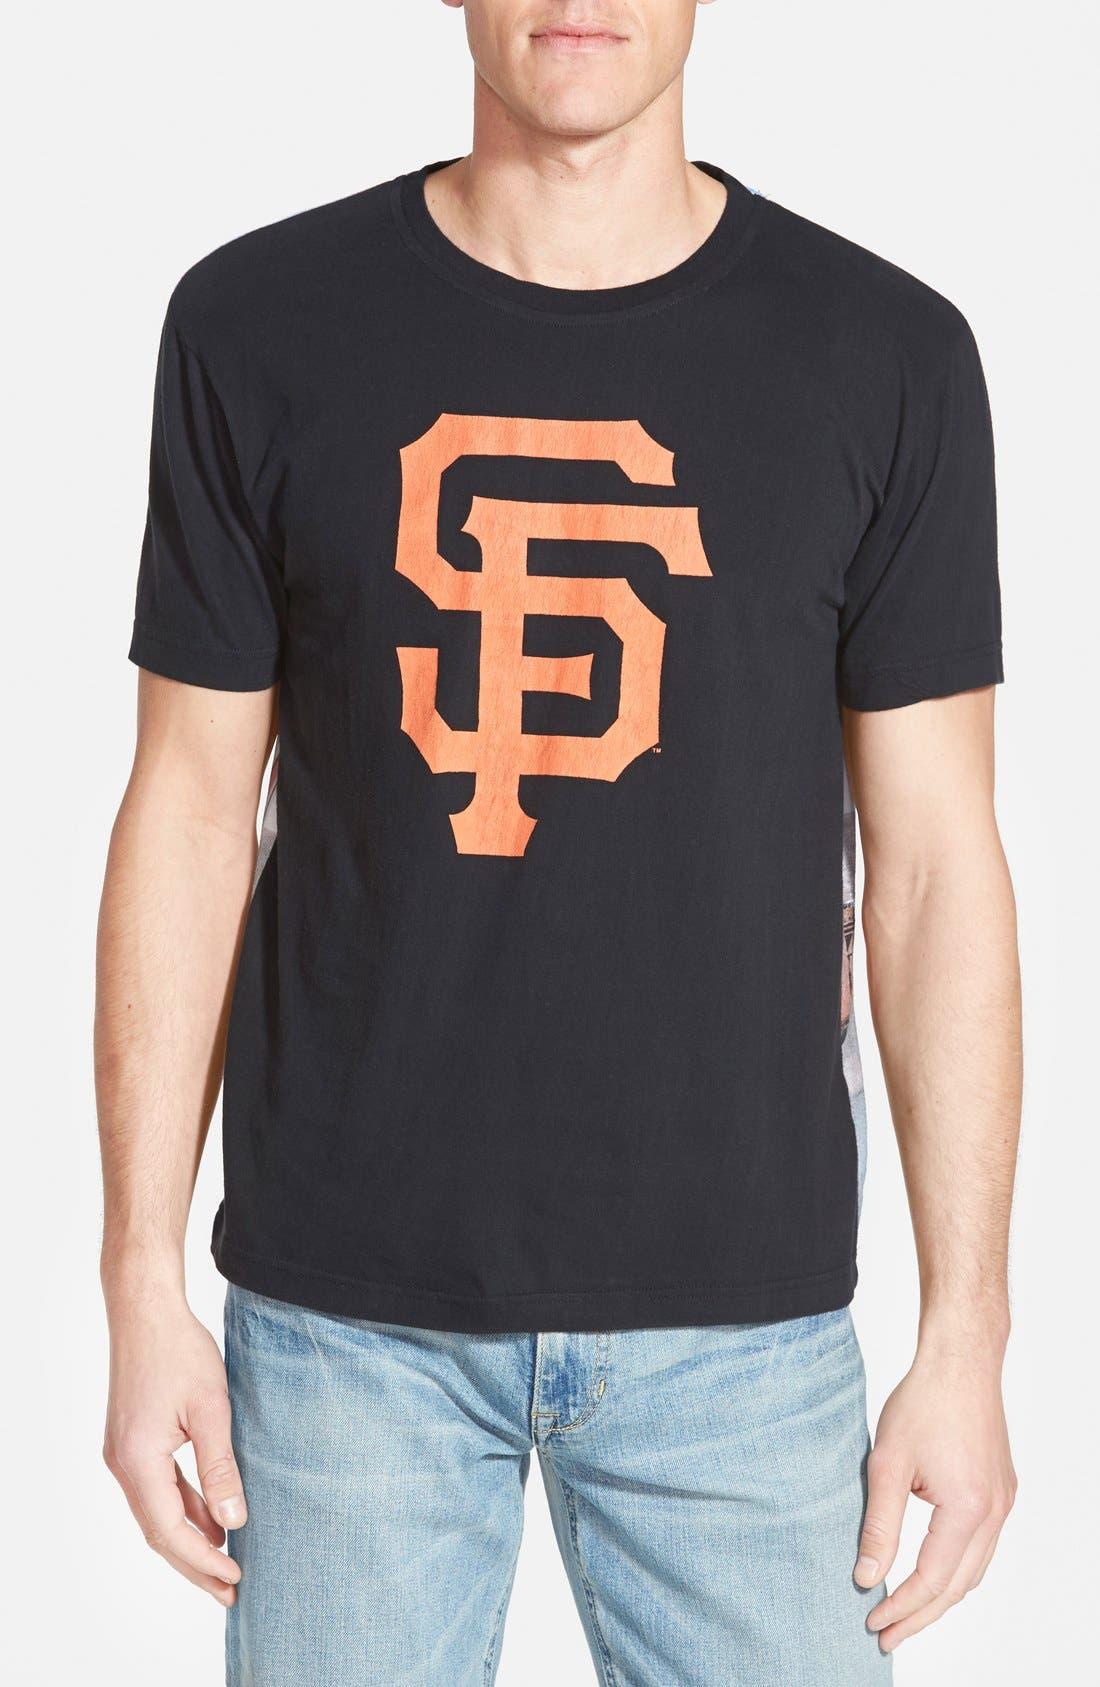 Wright & Ditson 'San Francisco Giants - Metro' Graphic Print T-Shirt